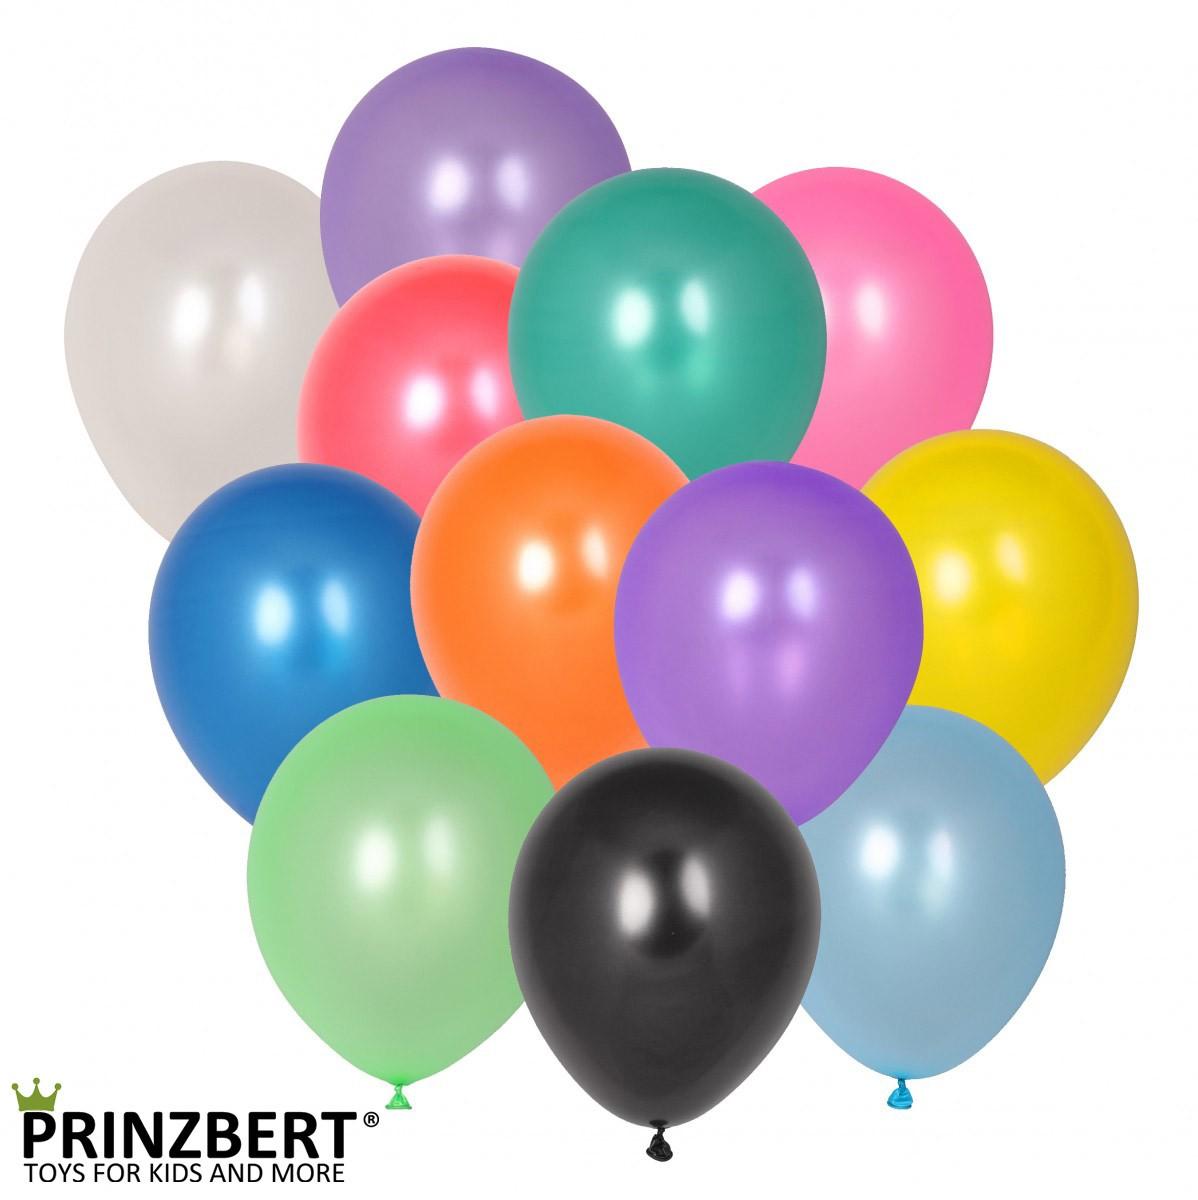 100 luftballons hell gr n partyballons 30 5 cm ballons metallic farbe luftballon f r deko. Black Bedroom Furniture Sets. Home Design Ideas